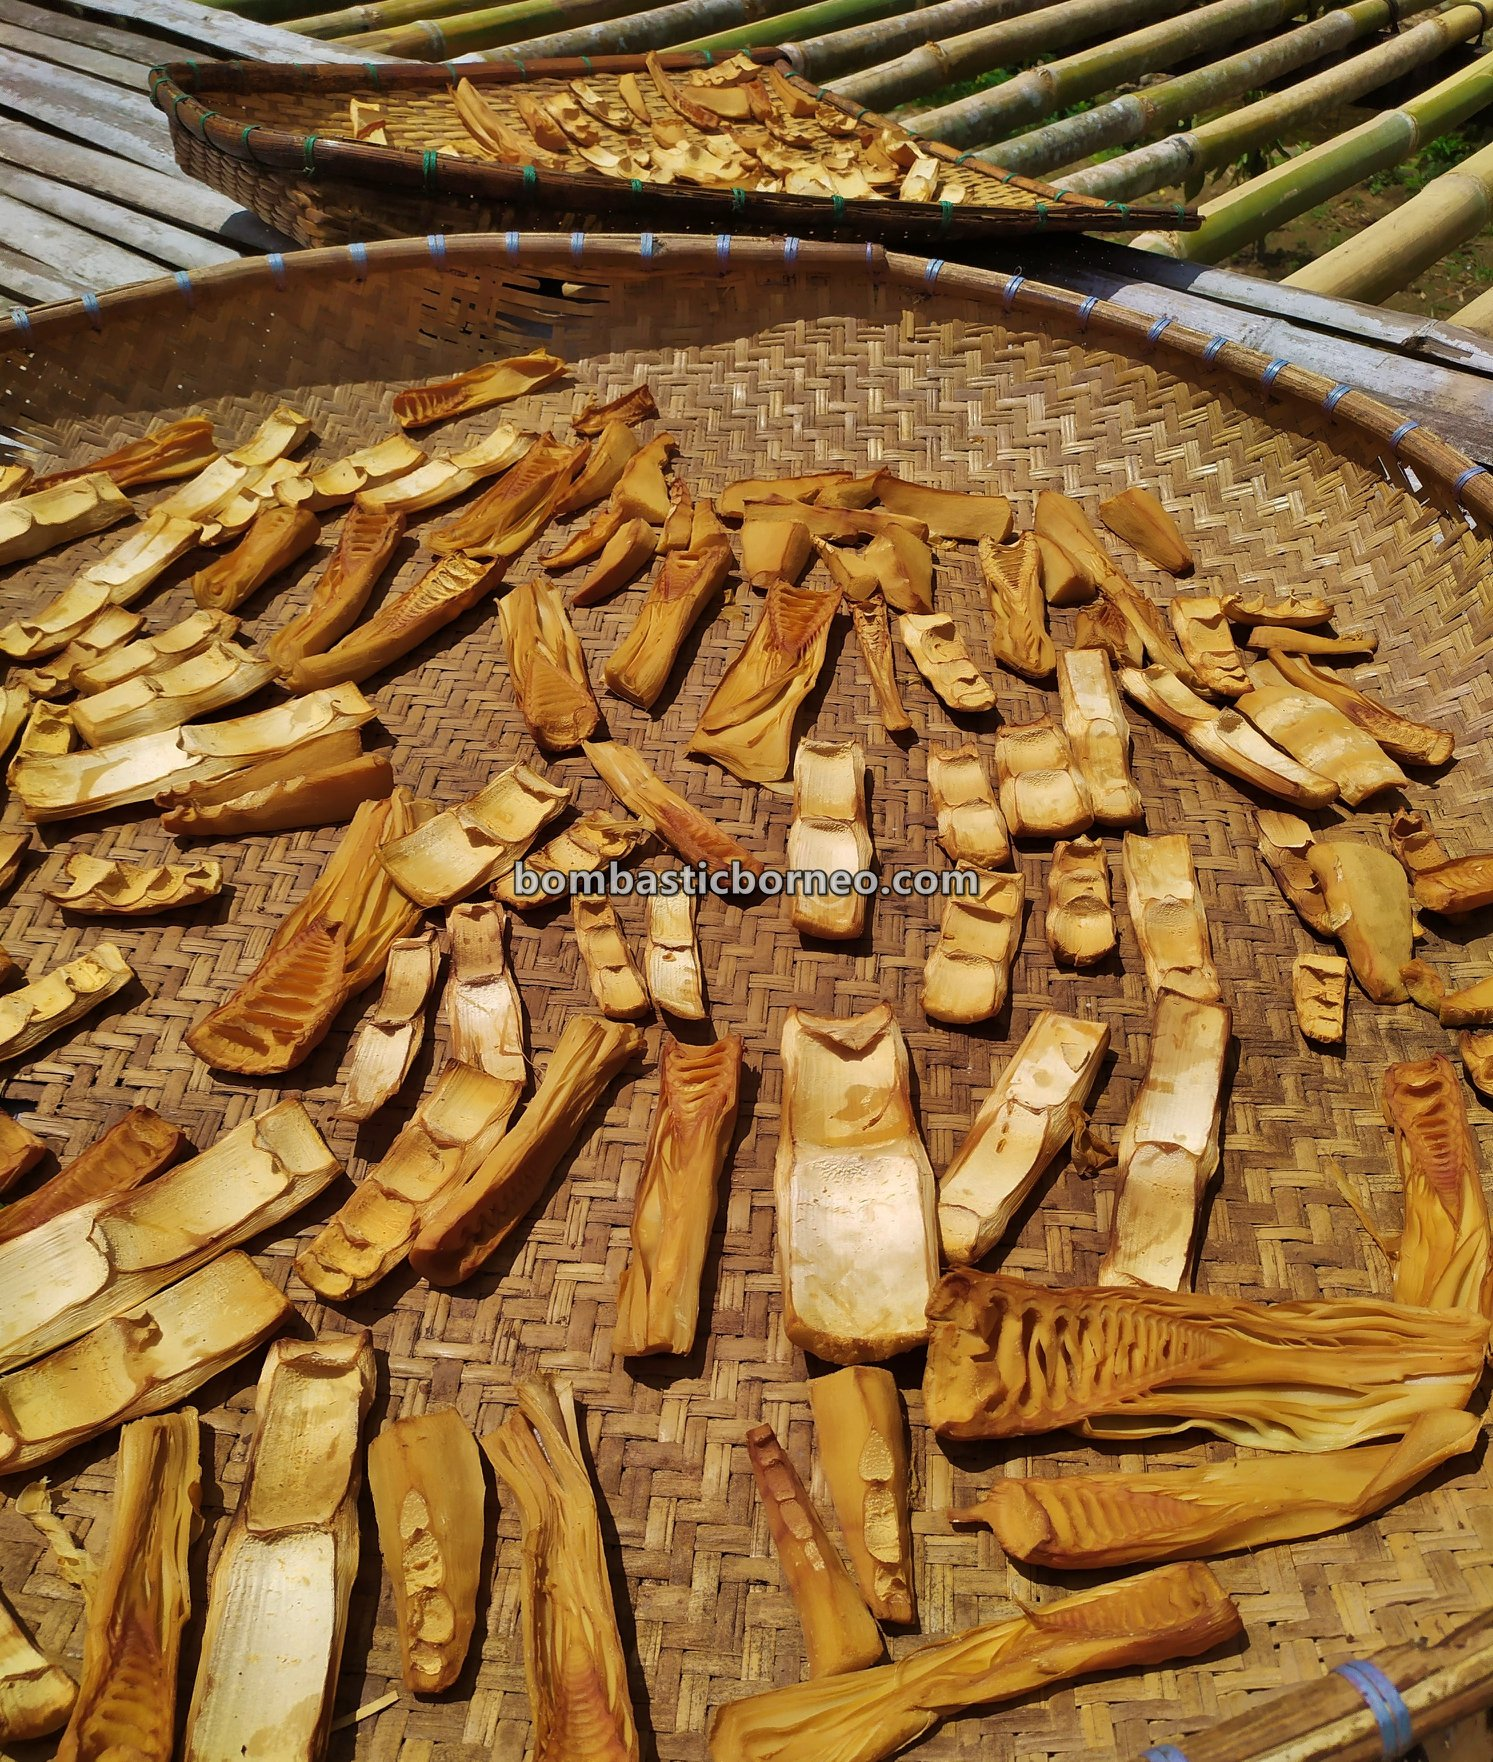 Sungkung Medeng, authentic, traditional, Bengkayang, Indonesia, native, Dayak Bidayuh, tribe, village, Tourism, Travel guide, 婆罗洲原住民部落, 印尼西加里曼丹,